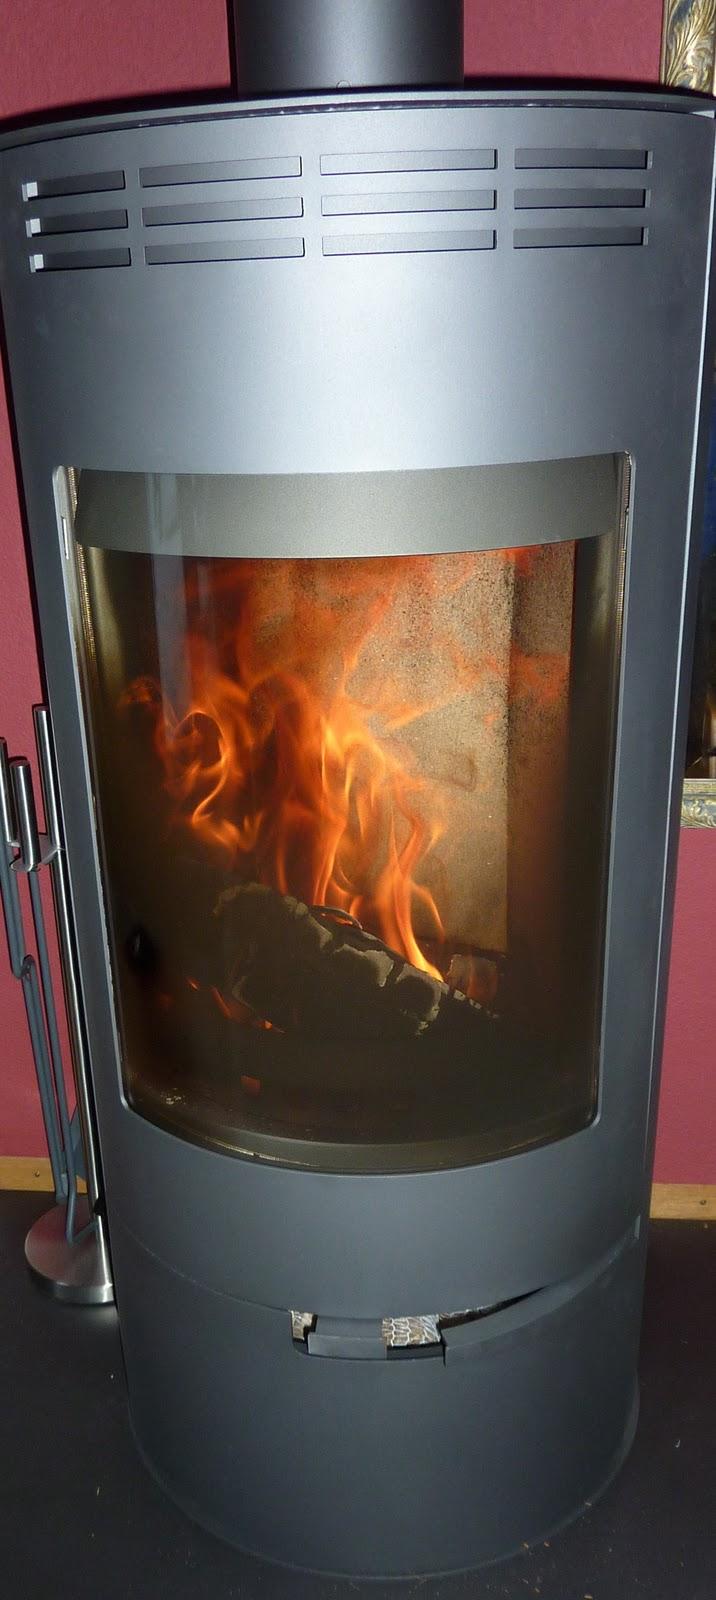 mohnblueme anz ndhilfen f r cheminee ofen grill feuer. Black Bedroom Furniture Sets. Home Design Ideas